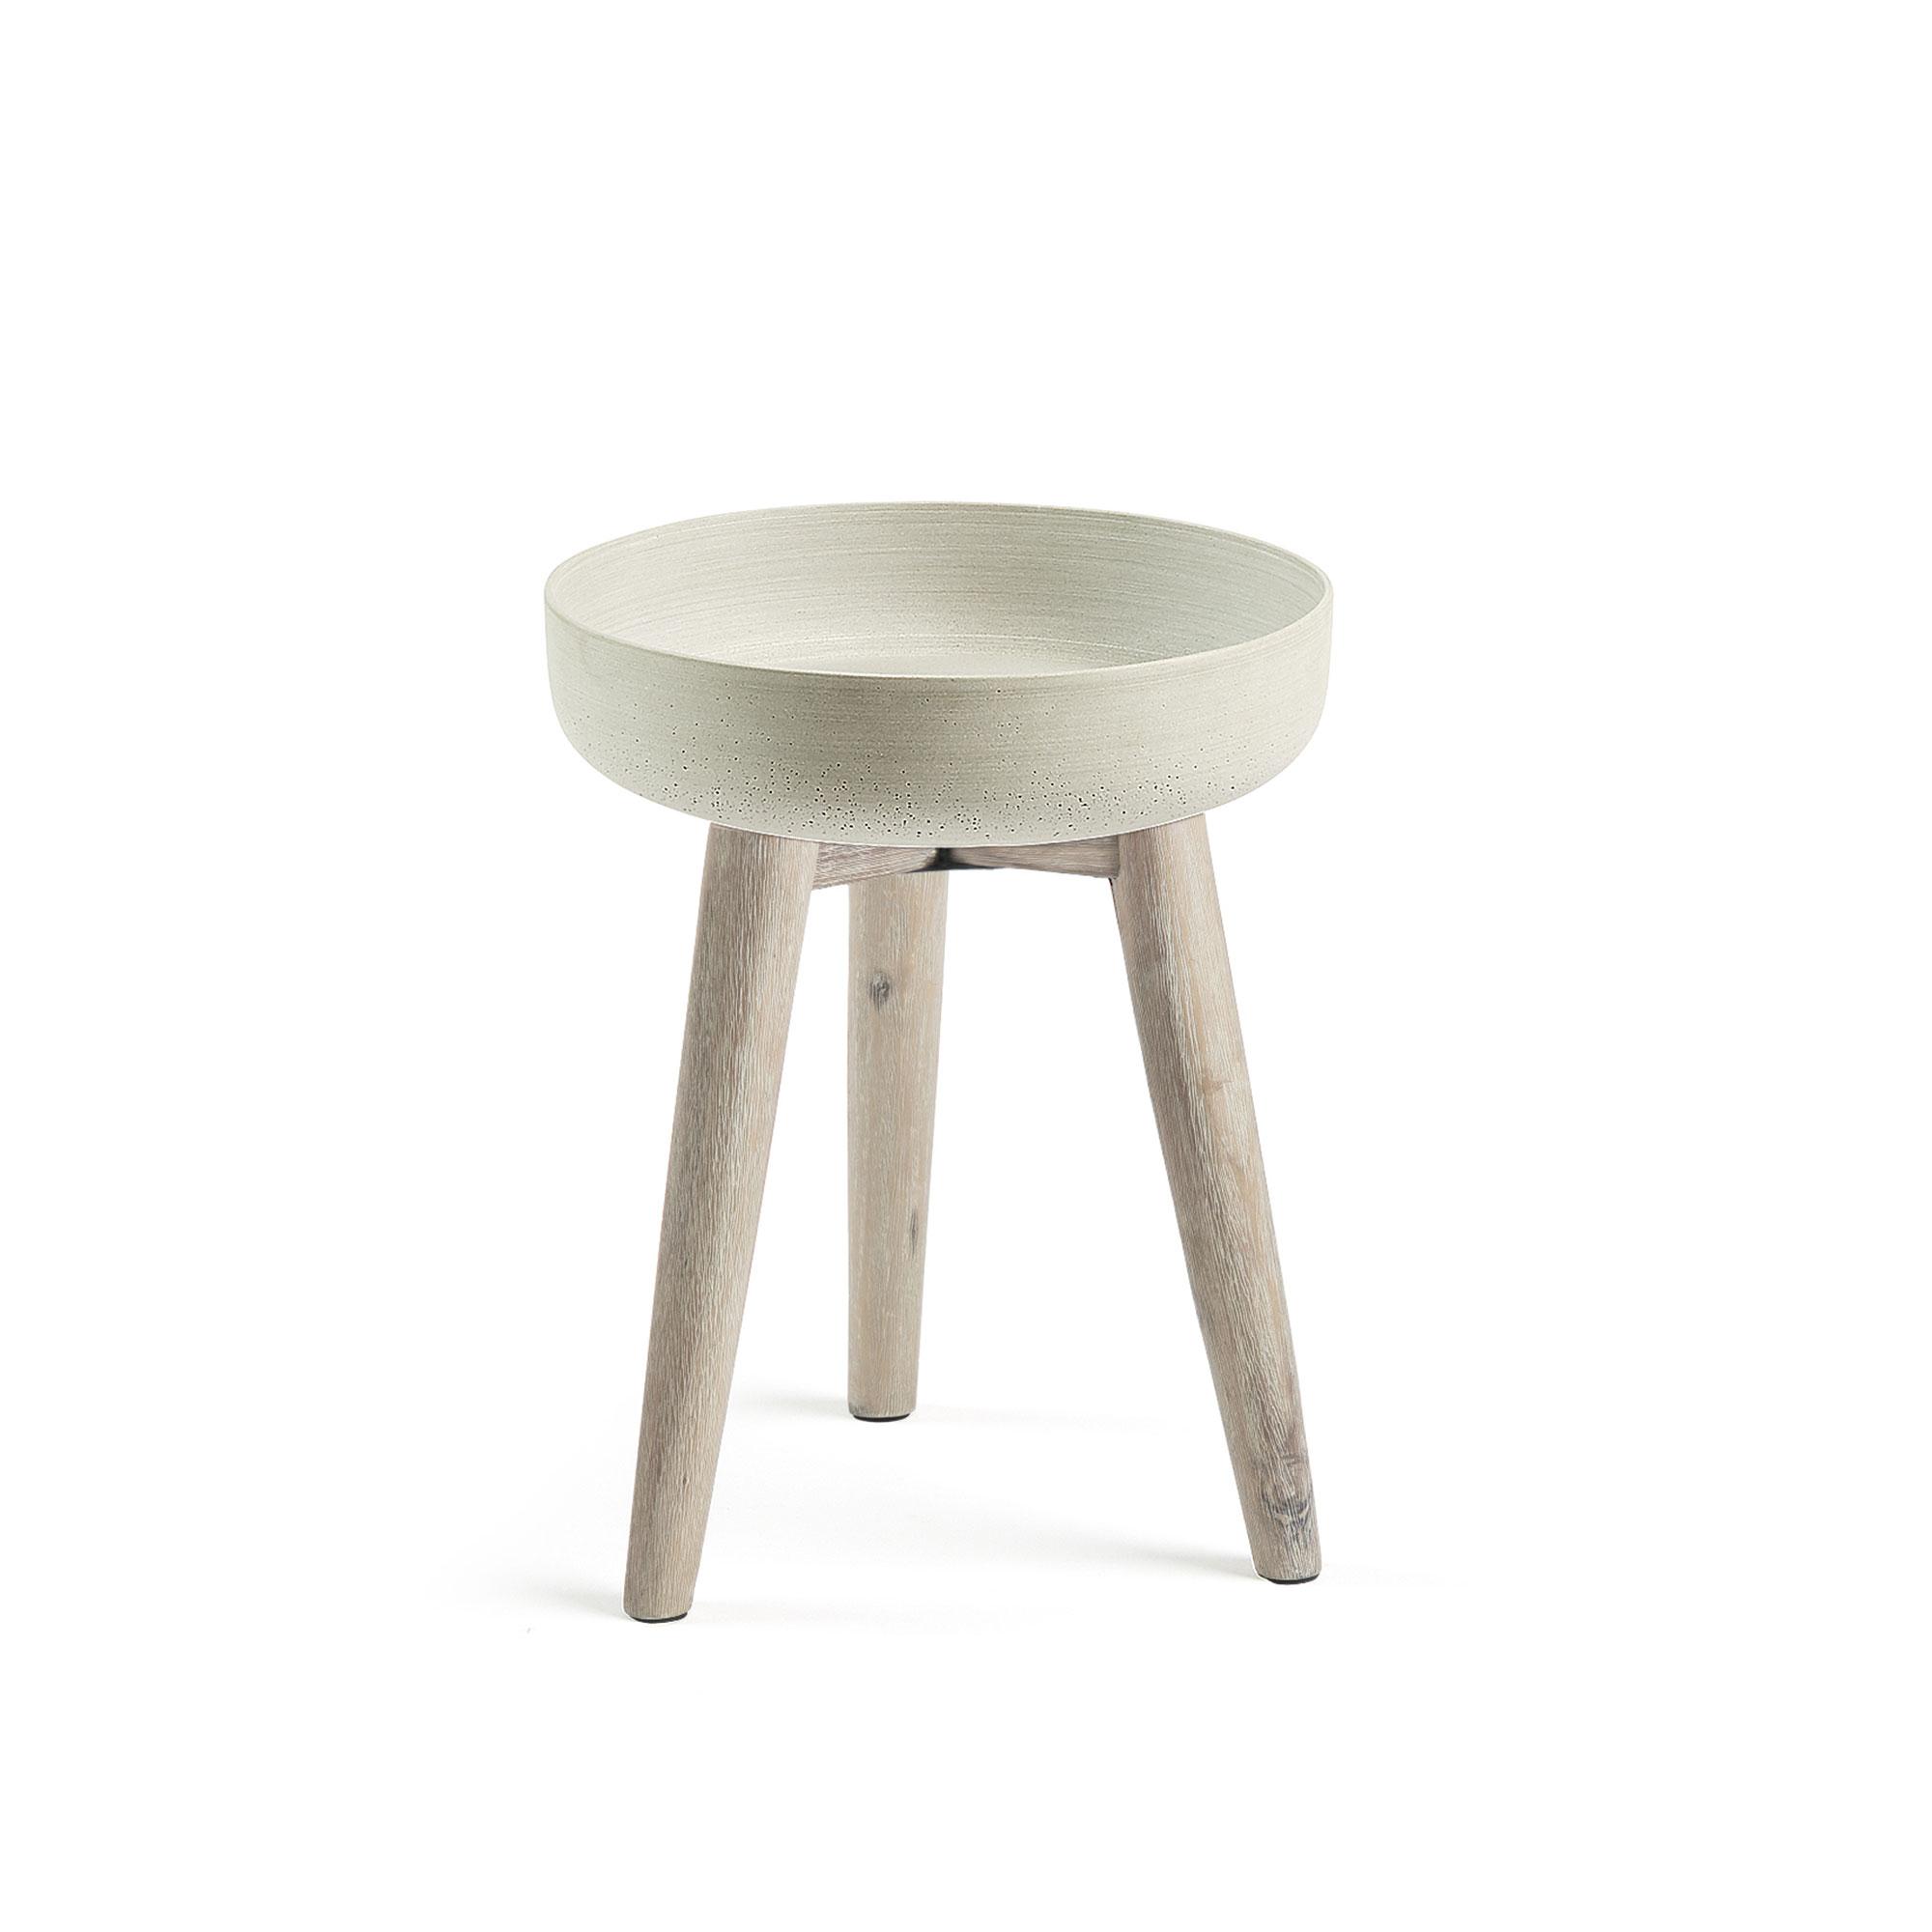 laforma – Laforma stahl urtepotteskjuler - grå/natur cement/akacietræ, rund (ø36) på boboonline.dk